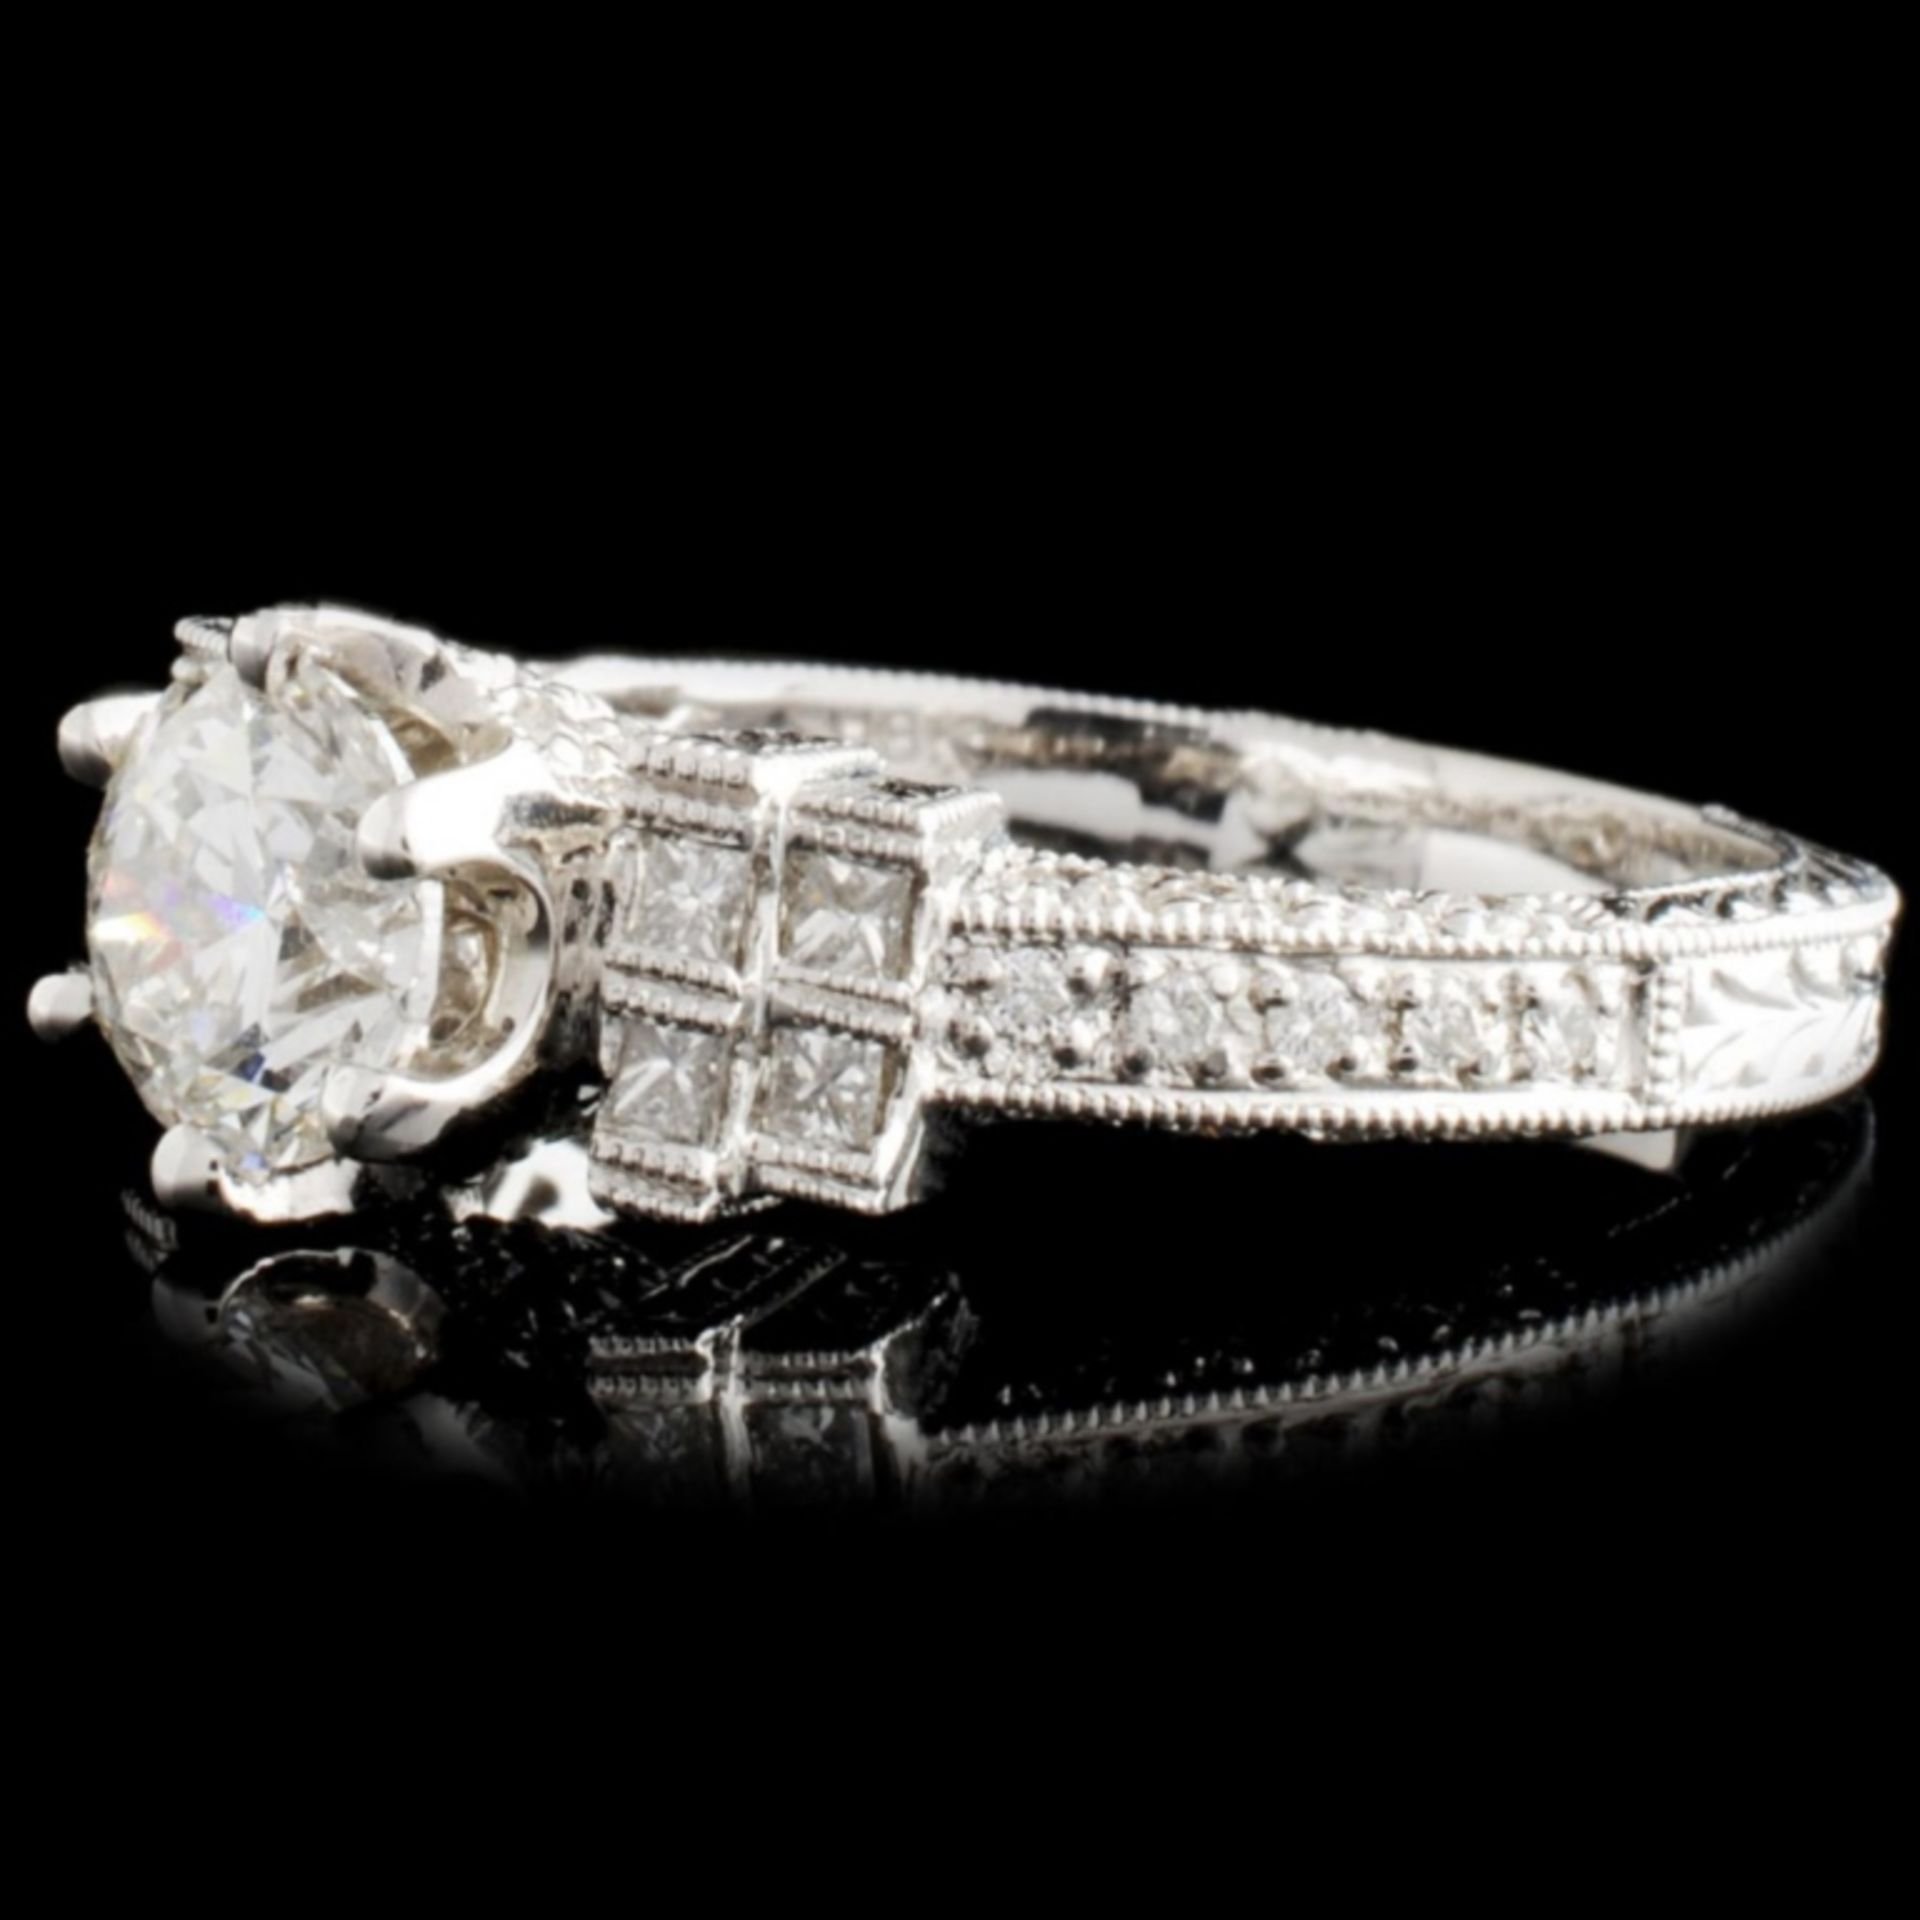 18K Gold 1.33ctw Diamond Ring - Image 2 of 4